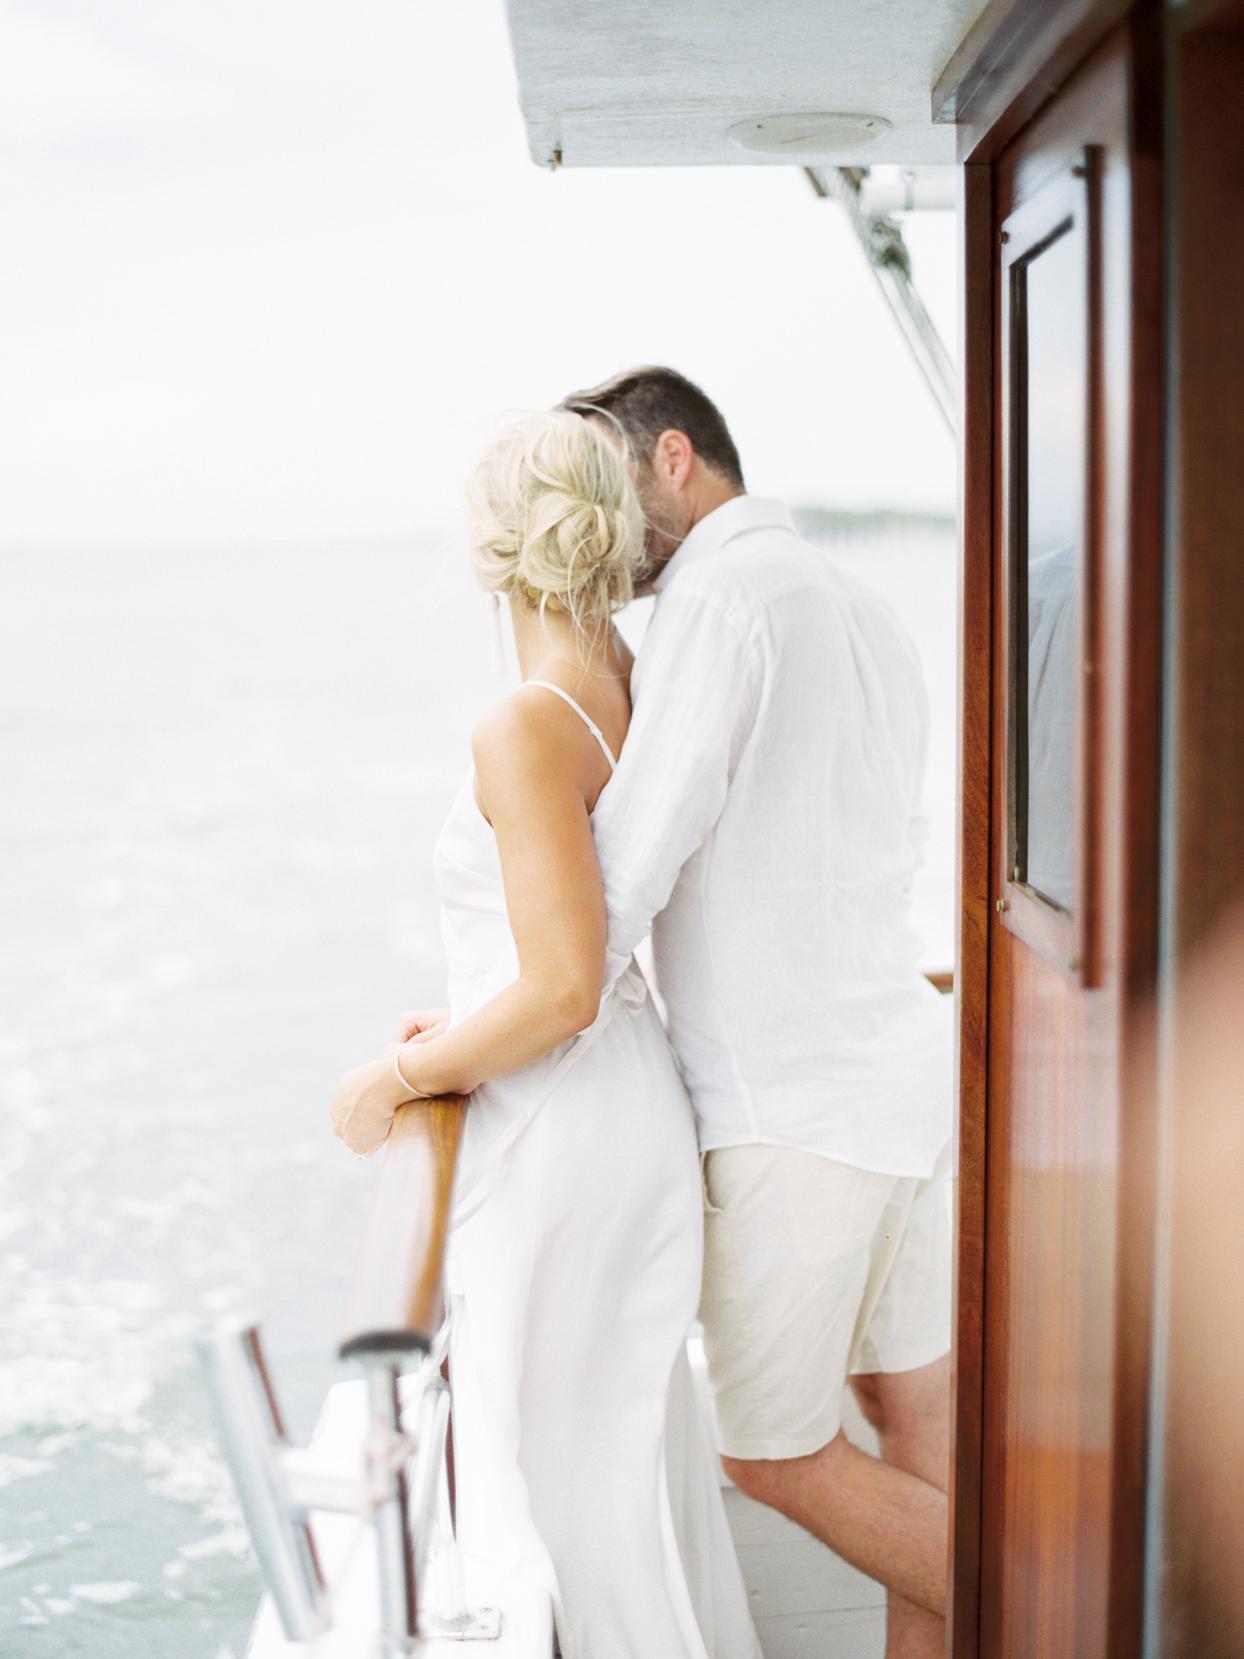 bride and groom standing on boat overlooking water